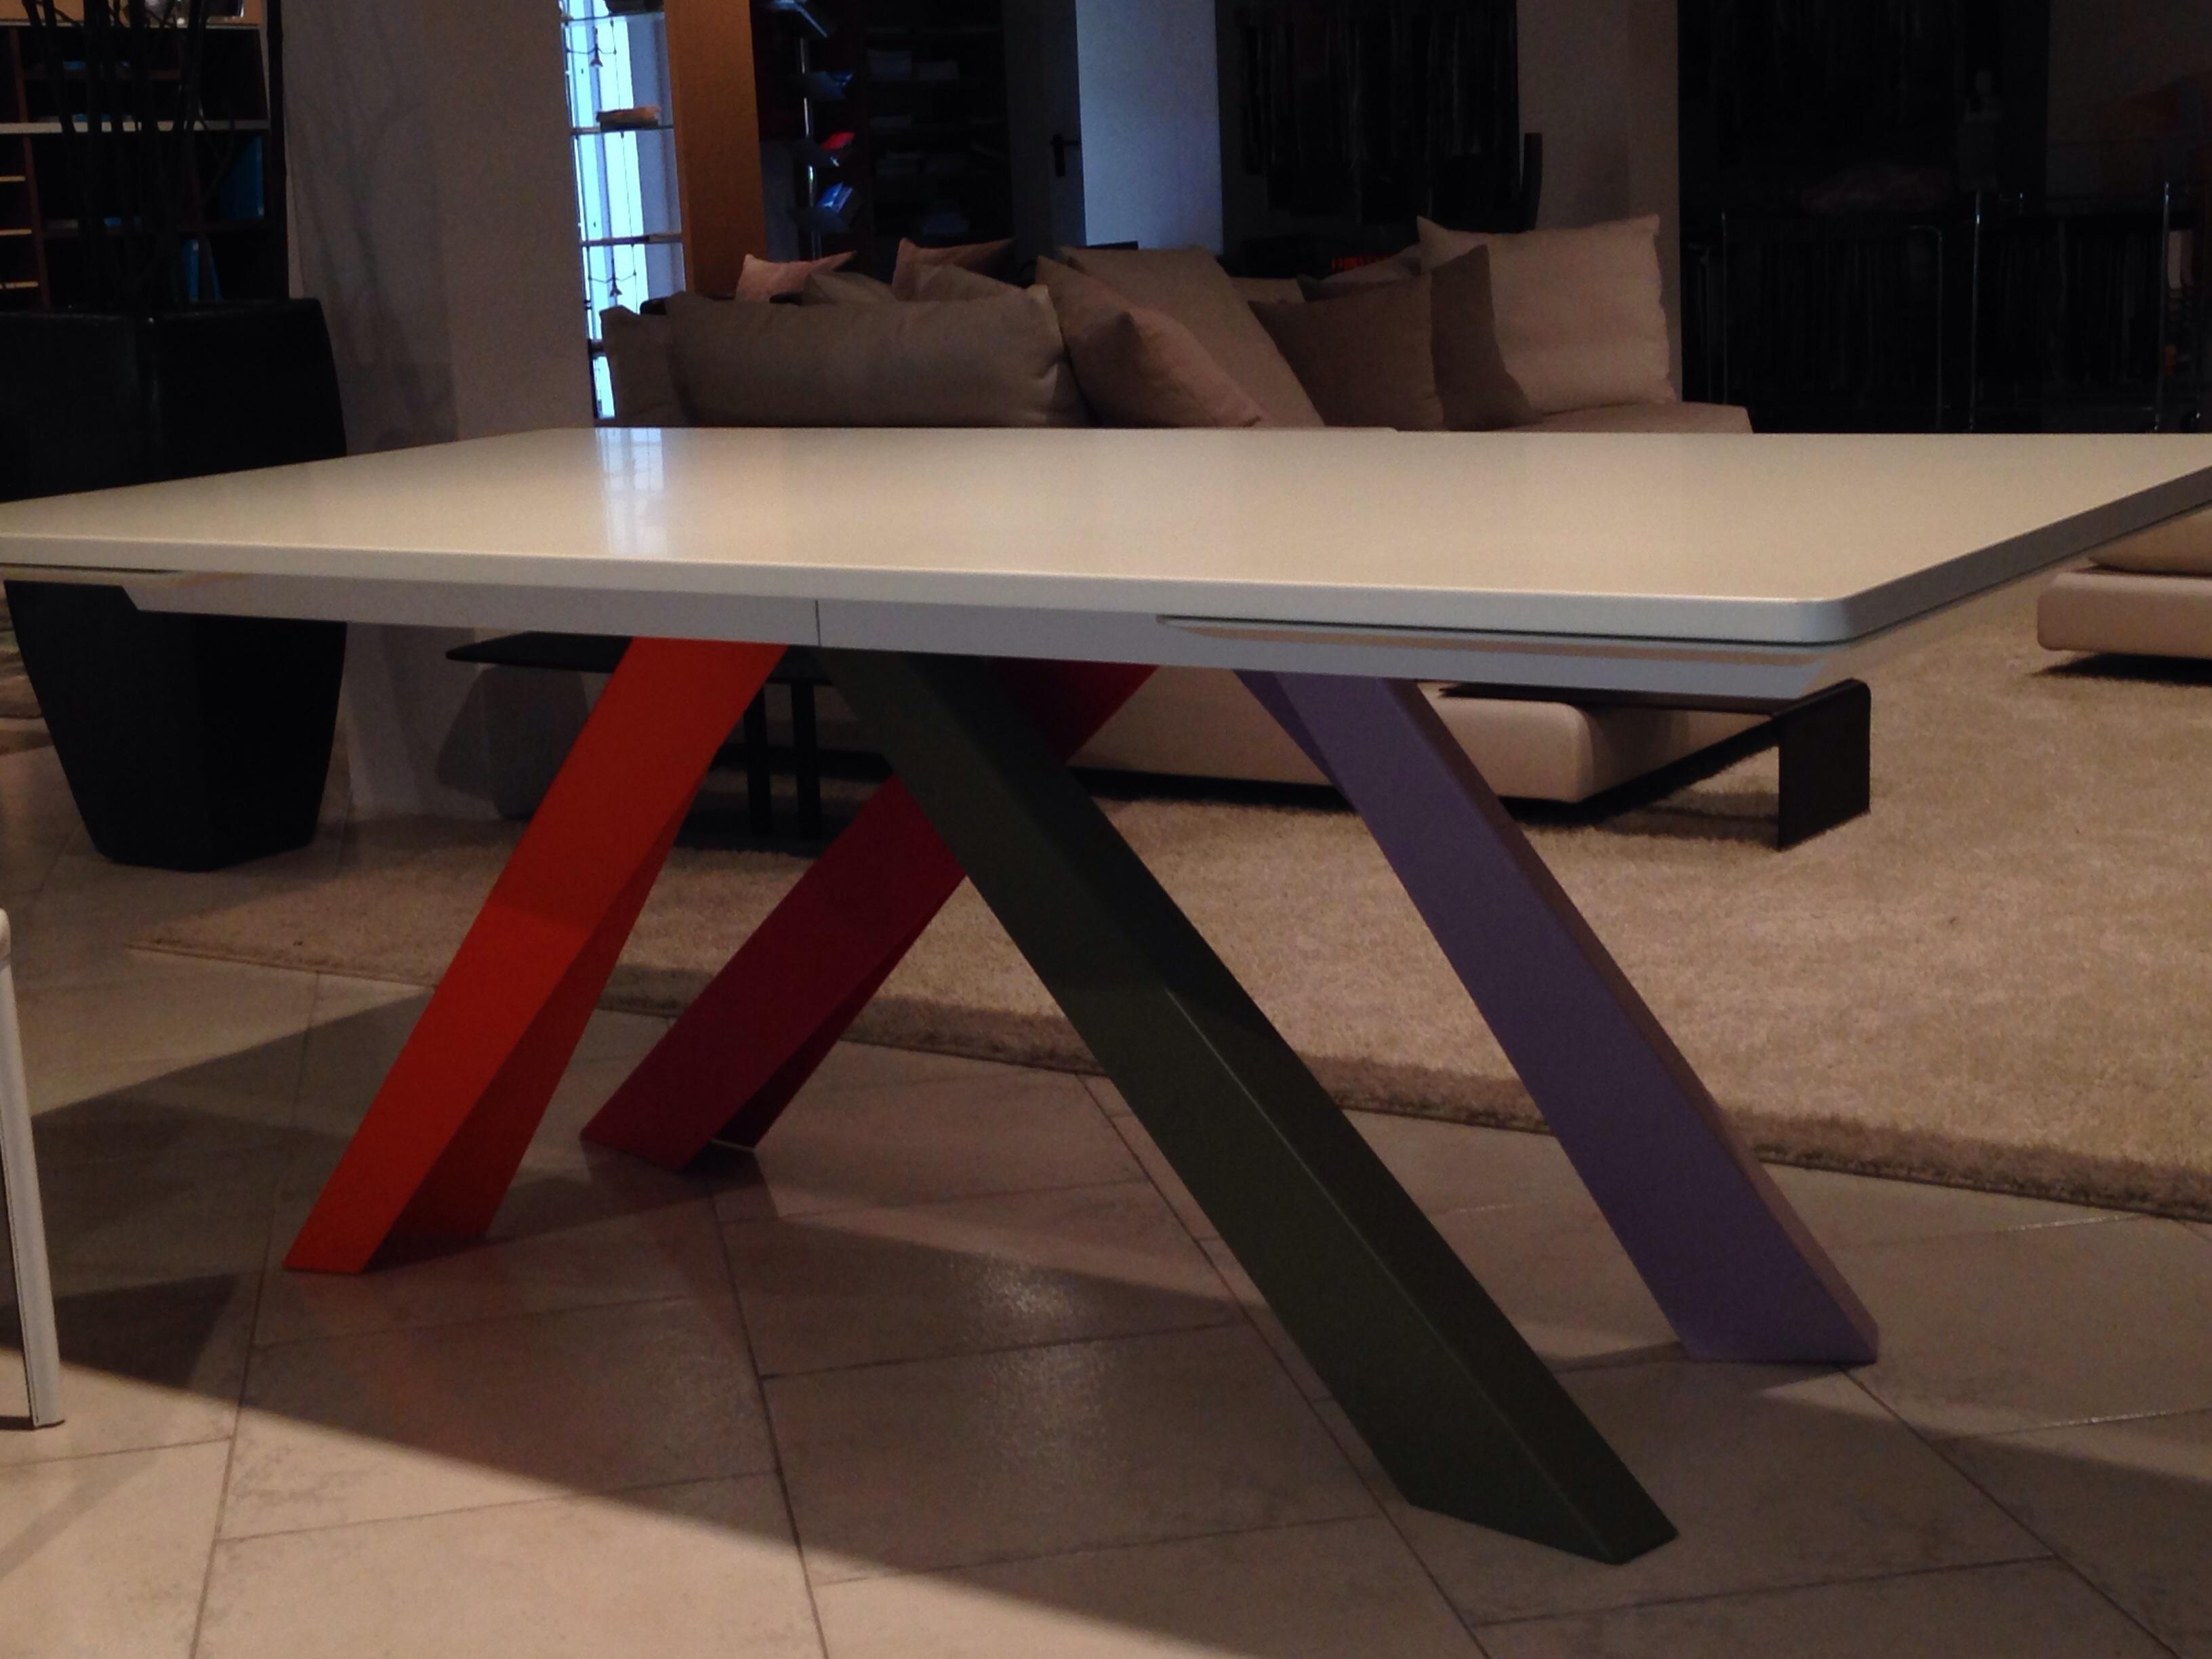 Emejing Big Table Bonaldo Prezzo Pictures - bery.us - bery.us